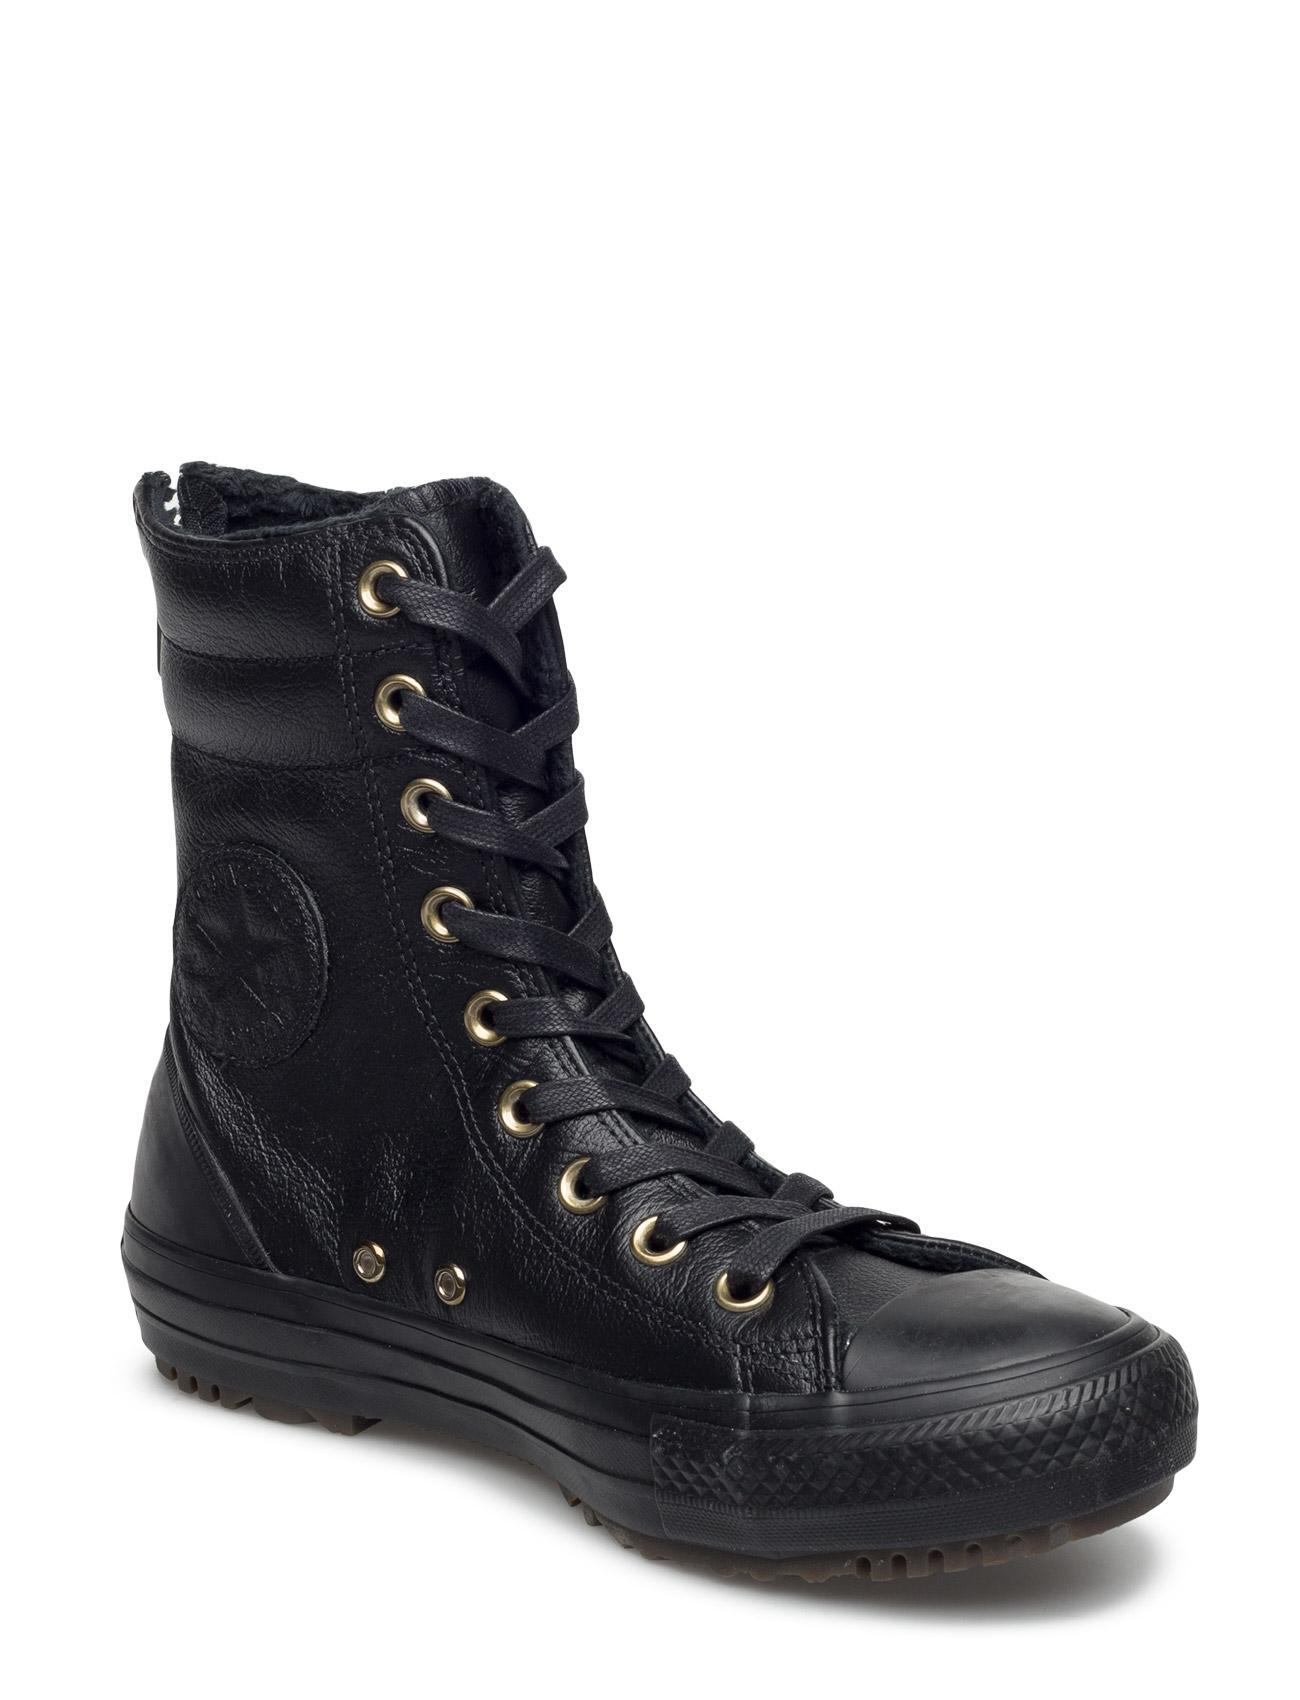 As Hi-Rise Leather Wmns X-Hi Converse Sneakers til Damer i